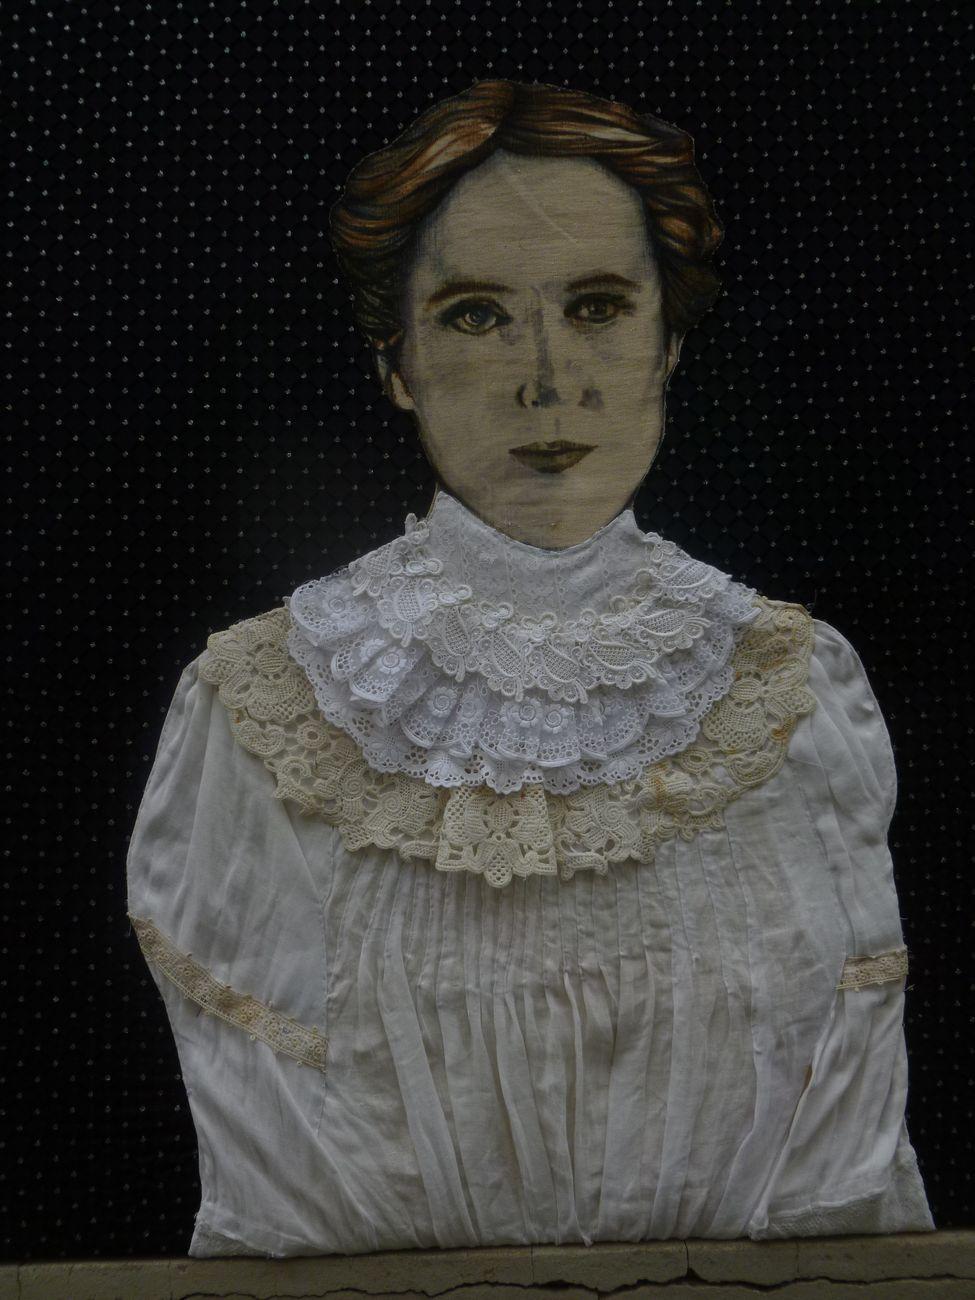 Silvia Zambarbieri - D'Iside, Ritratto di Henrietta Swan Leavitt, 2021. Courtesy Elisabeth Vermeer